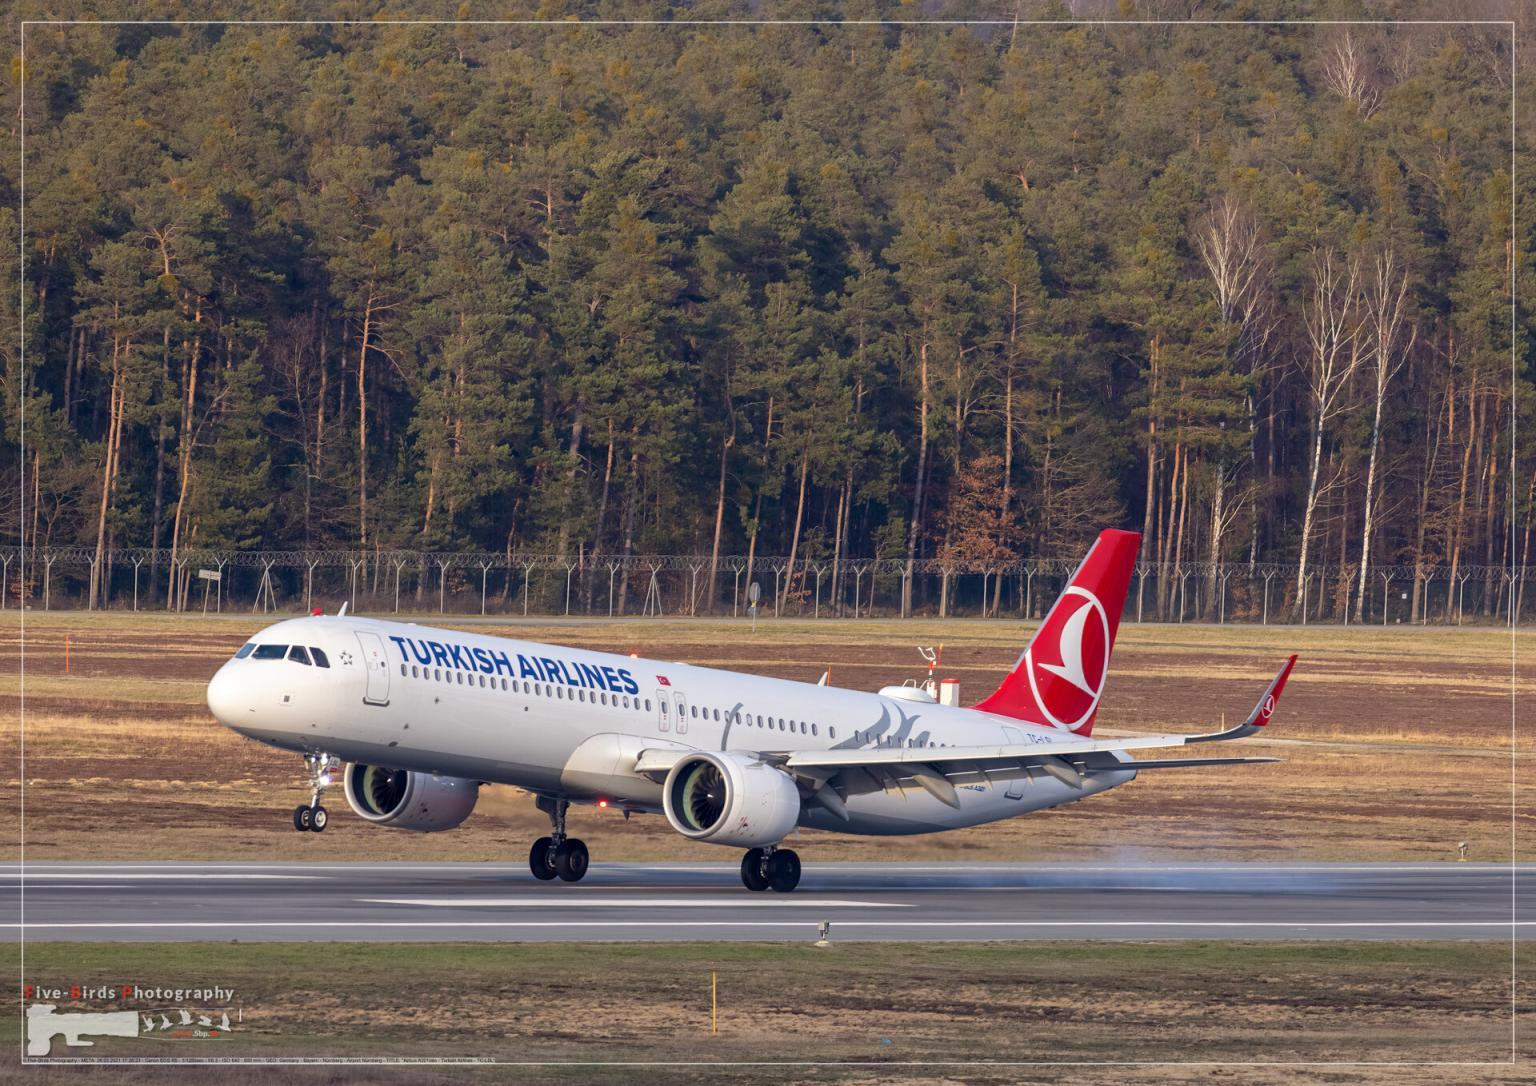 Landing of a jetliner at Nuremberg Airport